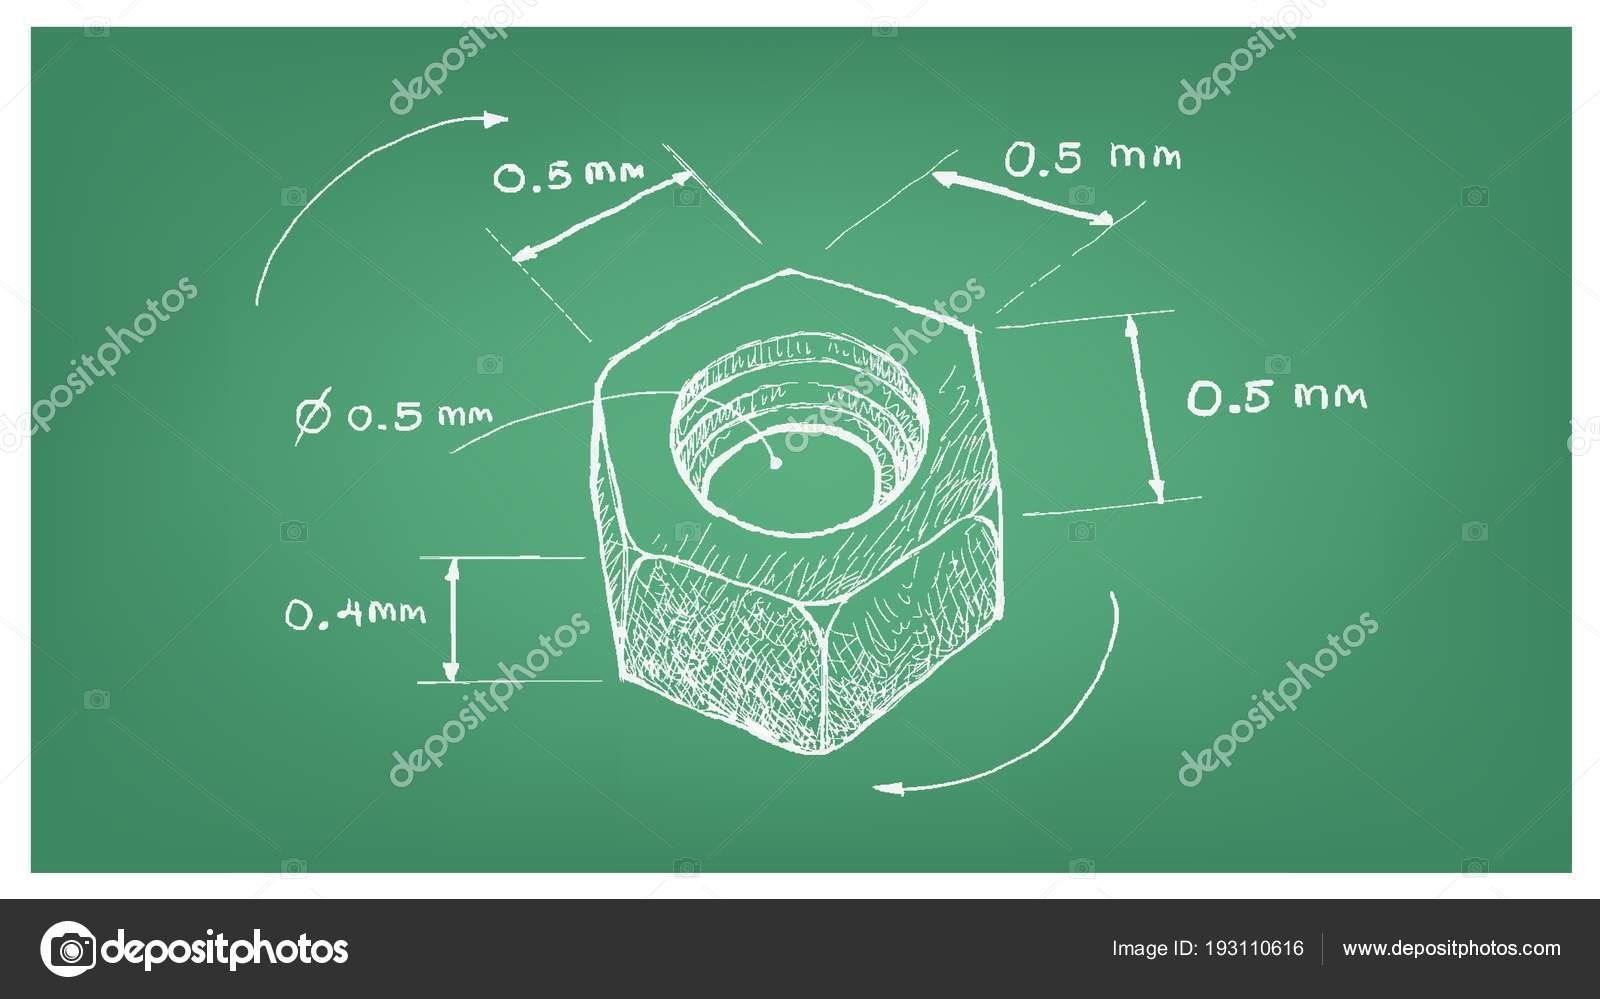 Dimension of hex nut screw on blueprint stock vector iamnee dimension of hex nut screw on blueprint stock vector malvernweather Choice Image